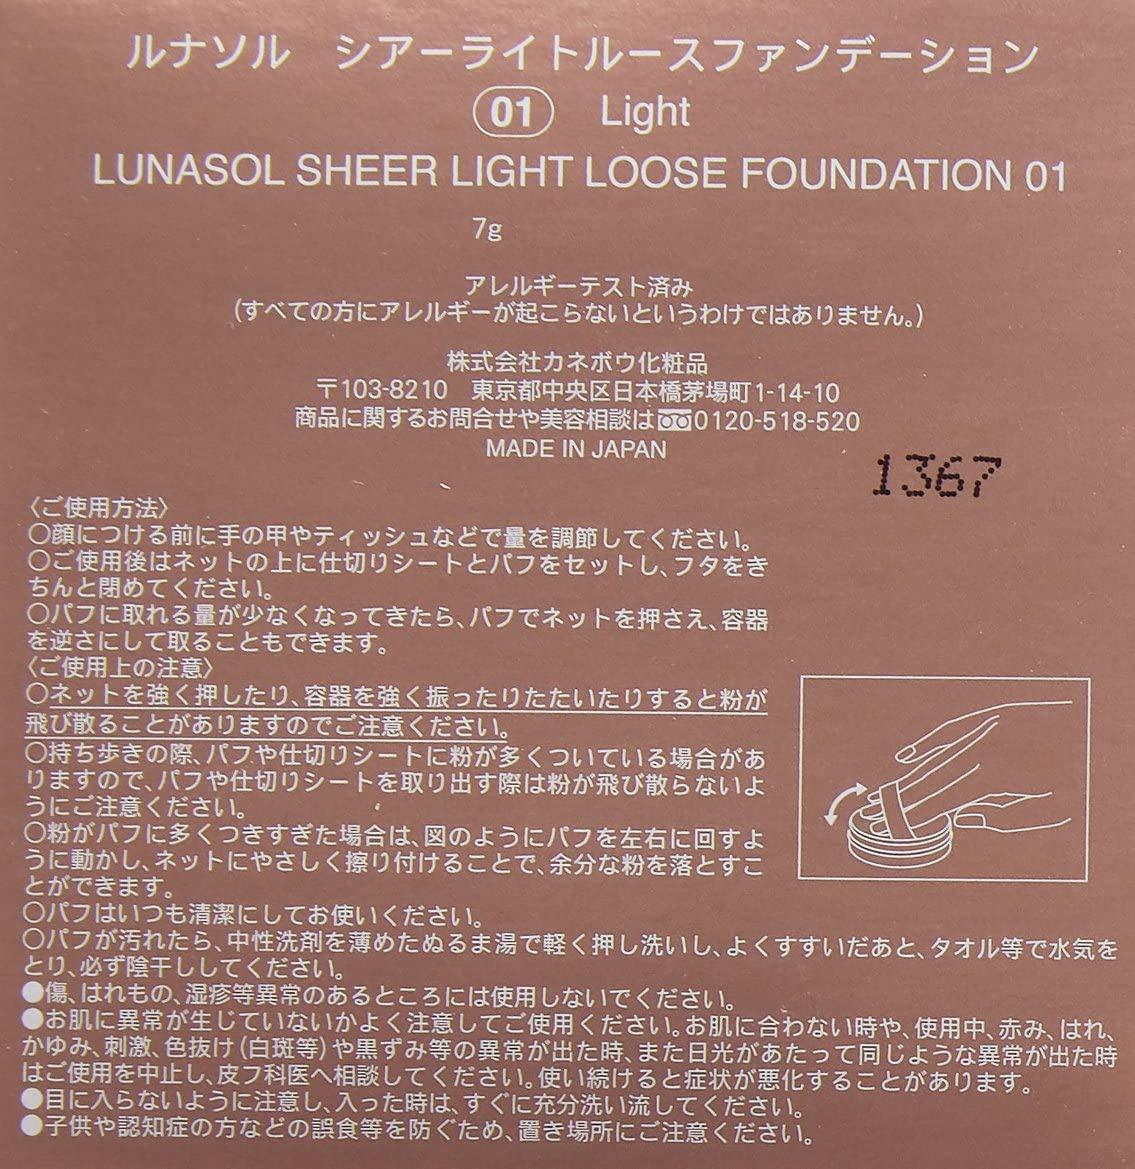 LUNASOL(ルナソル) シアーライトルースファンデーションの商品画像3